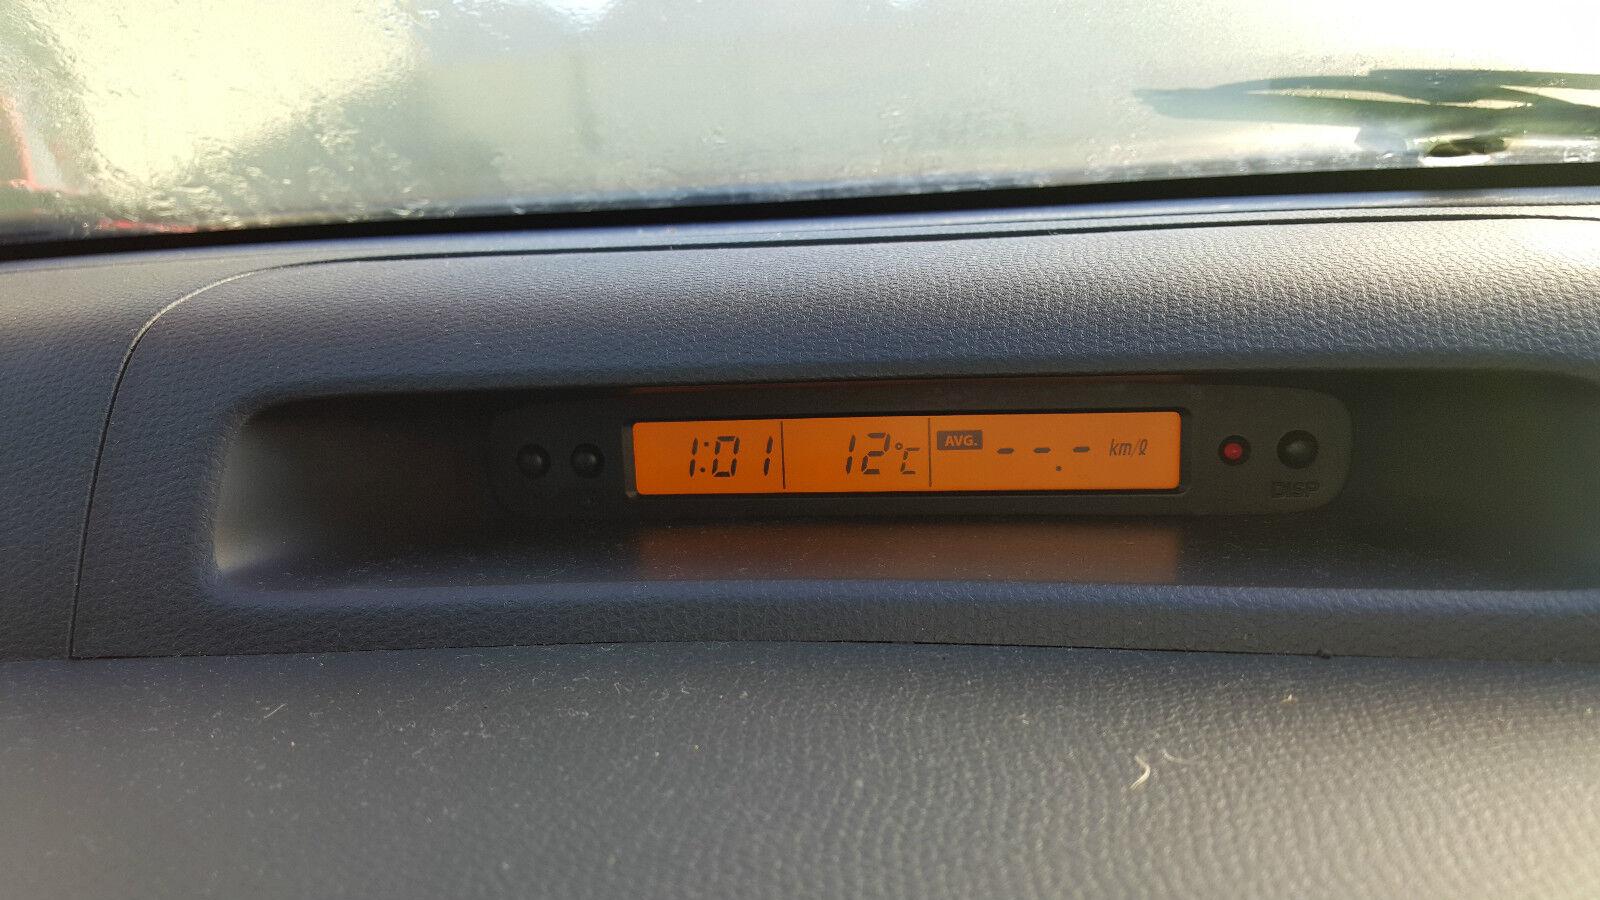 Suzuki Sidekick Tracker Air Conditioning Cooling Fan Motor Wiring Diagram